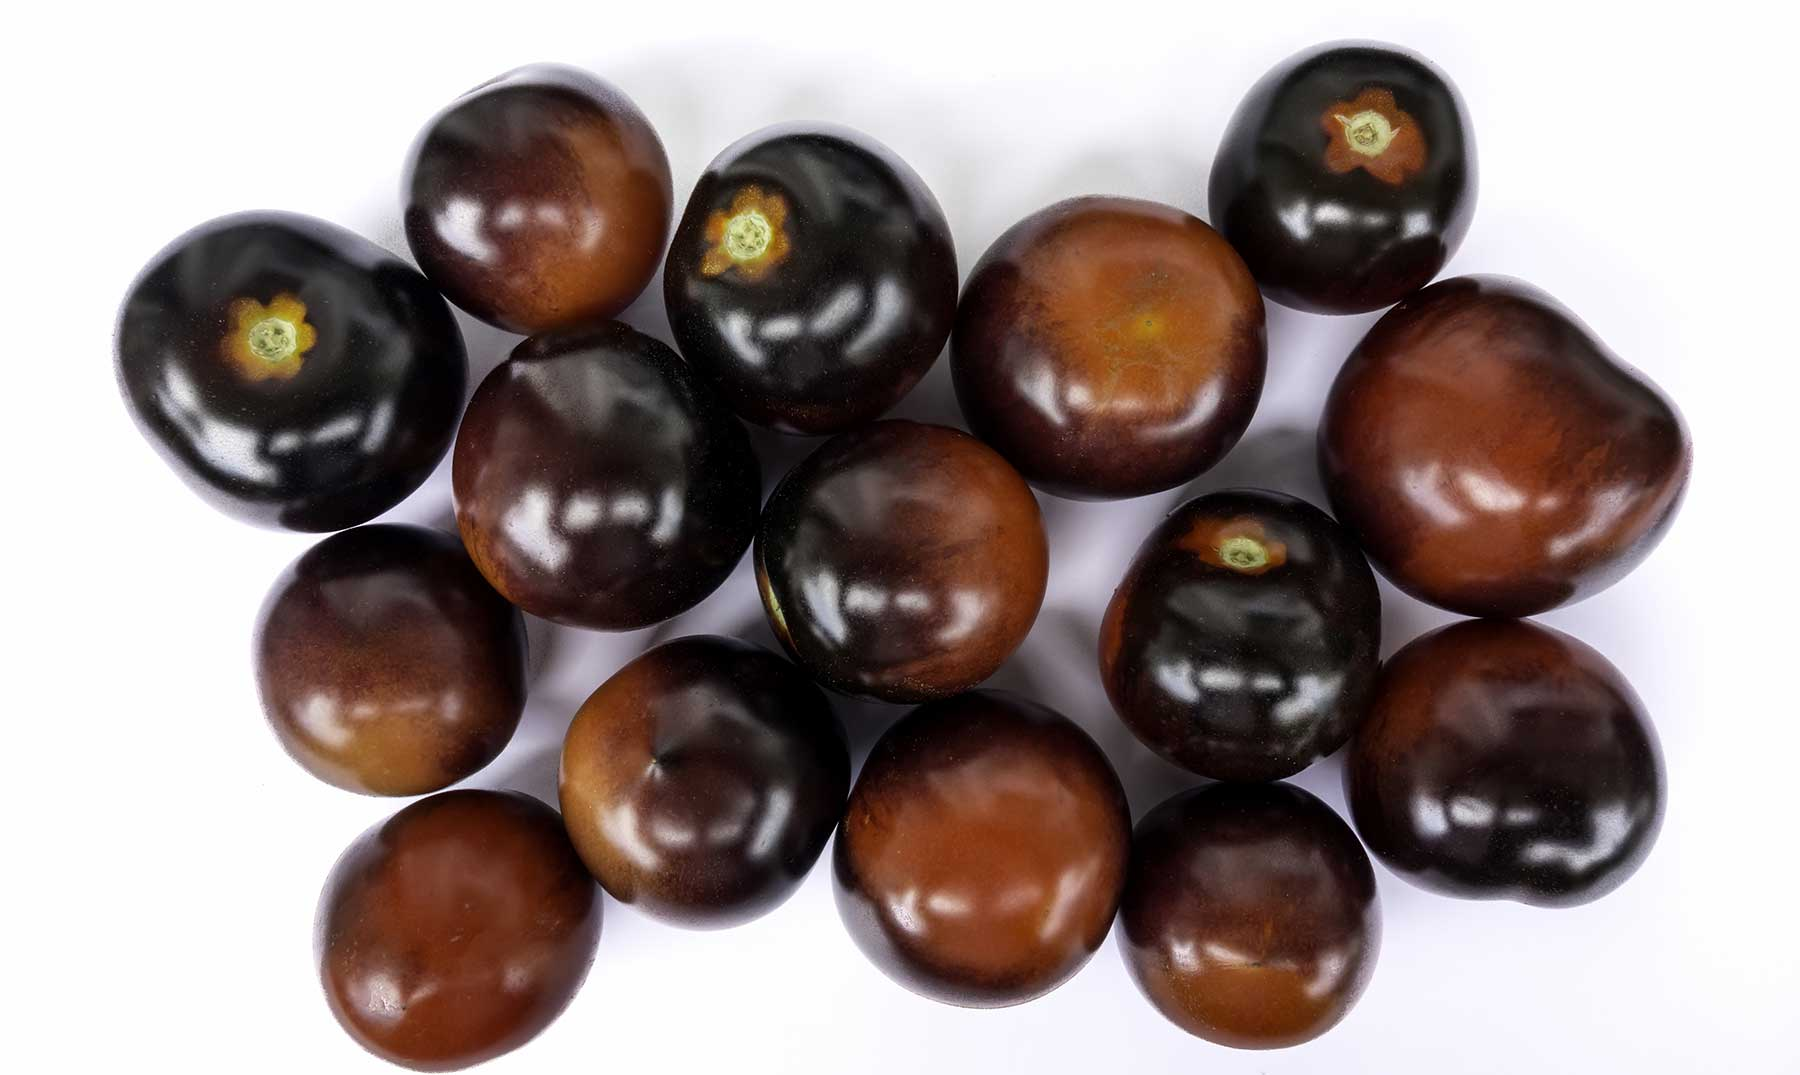 Tomate negro: sus poderes sanadores